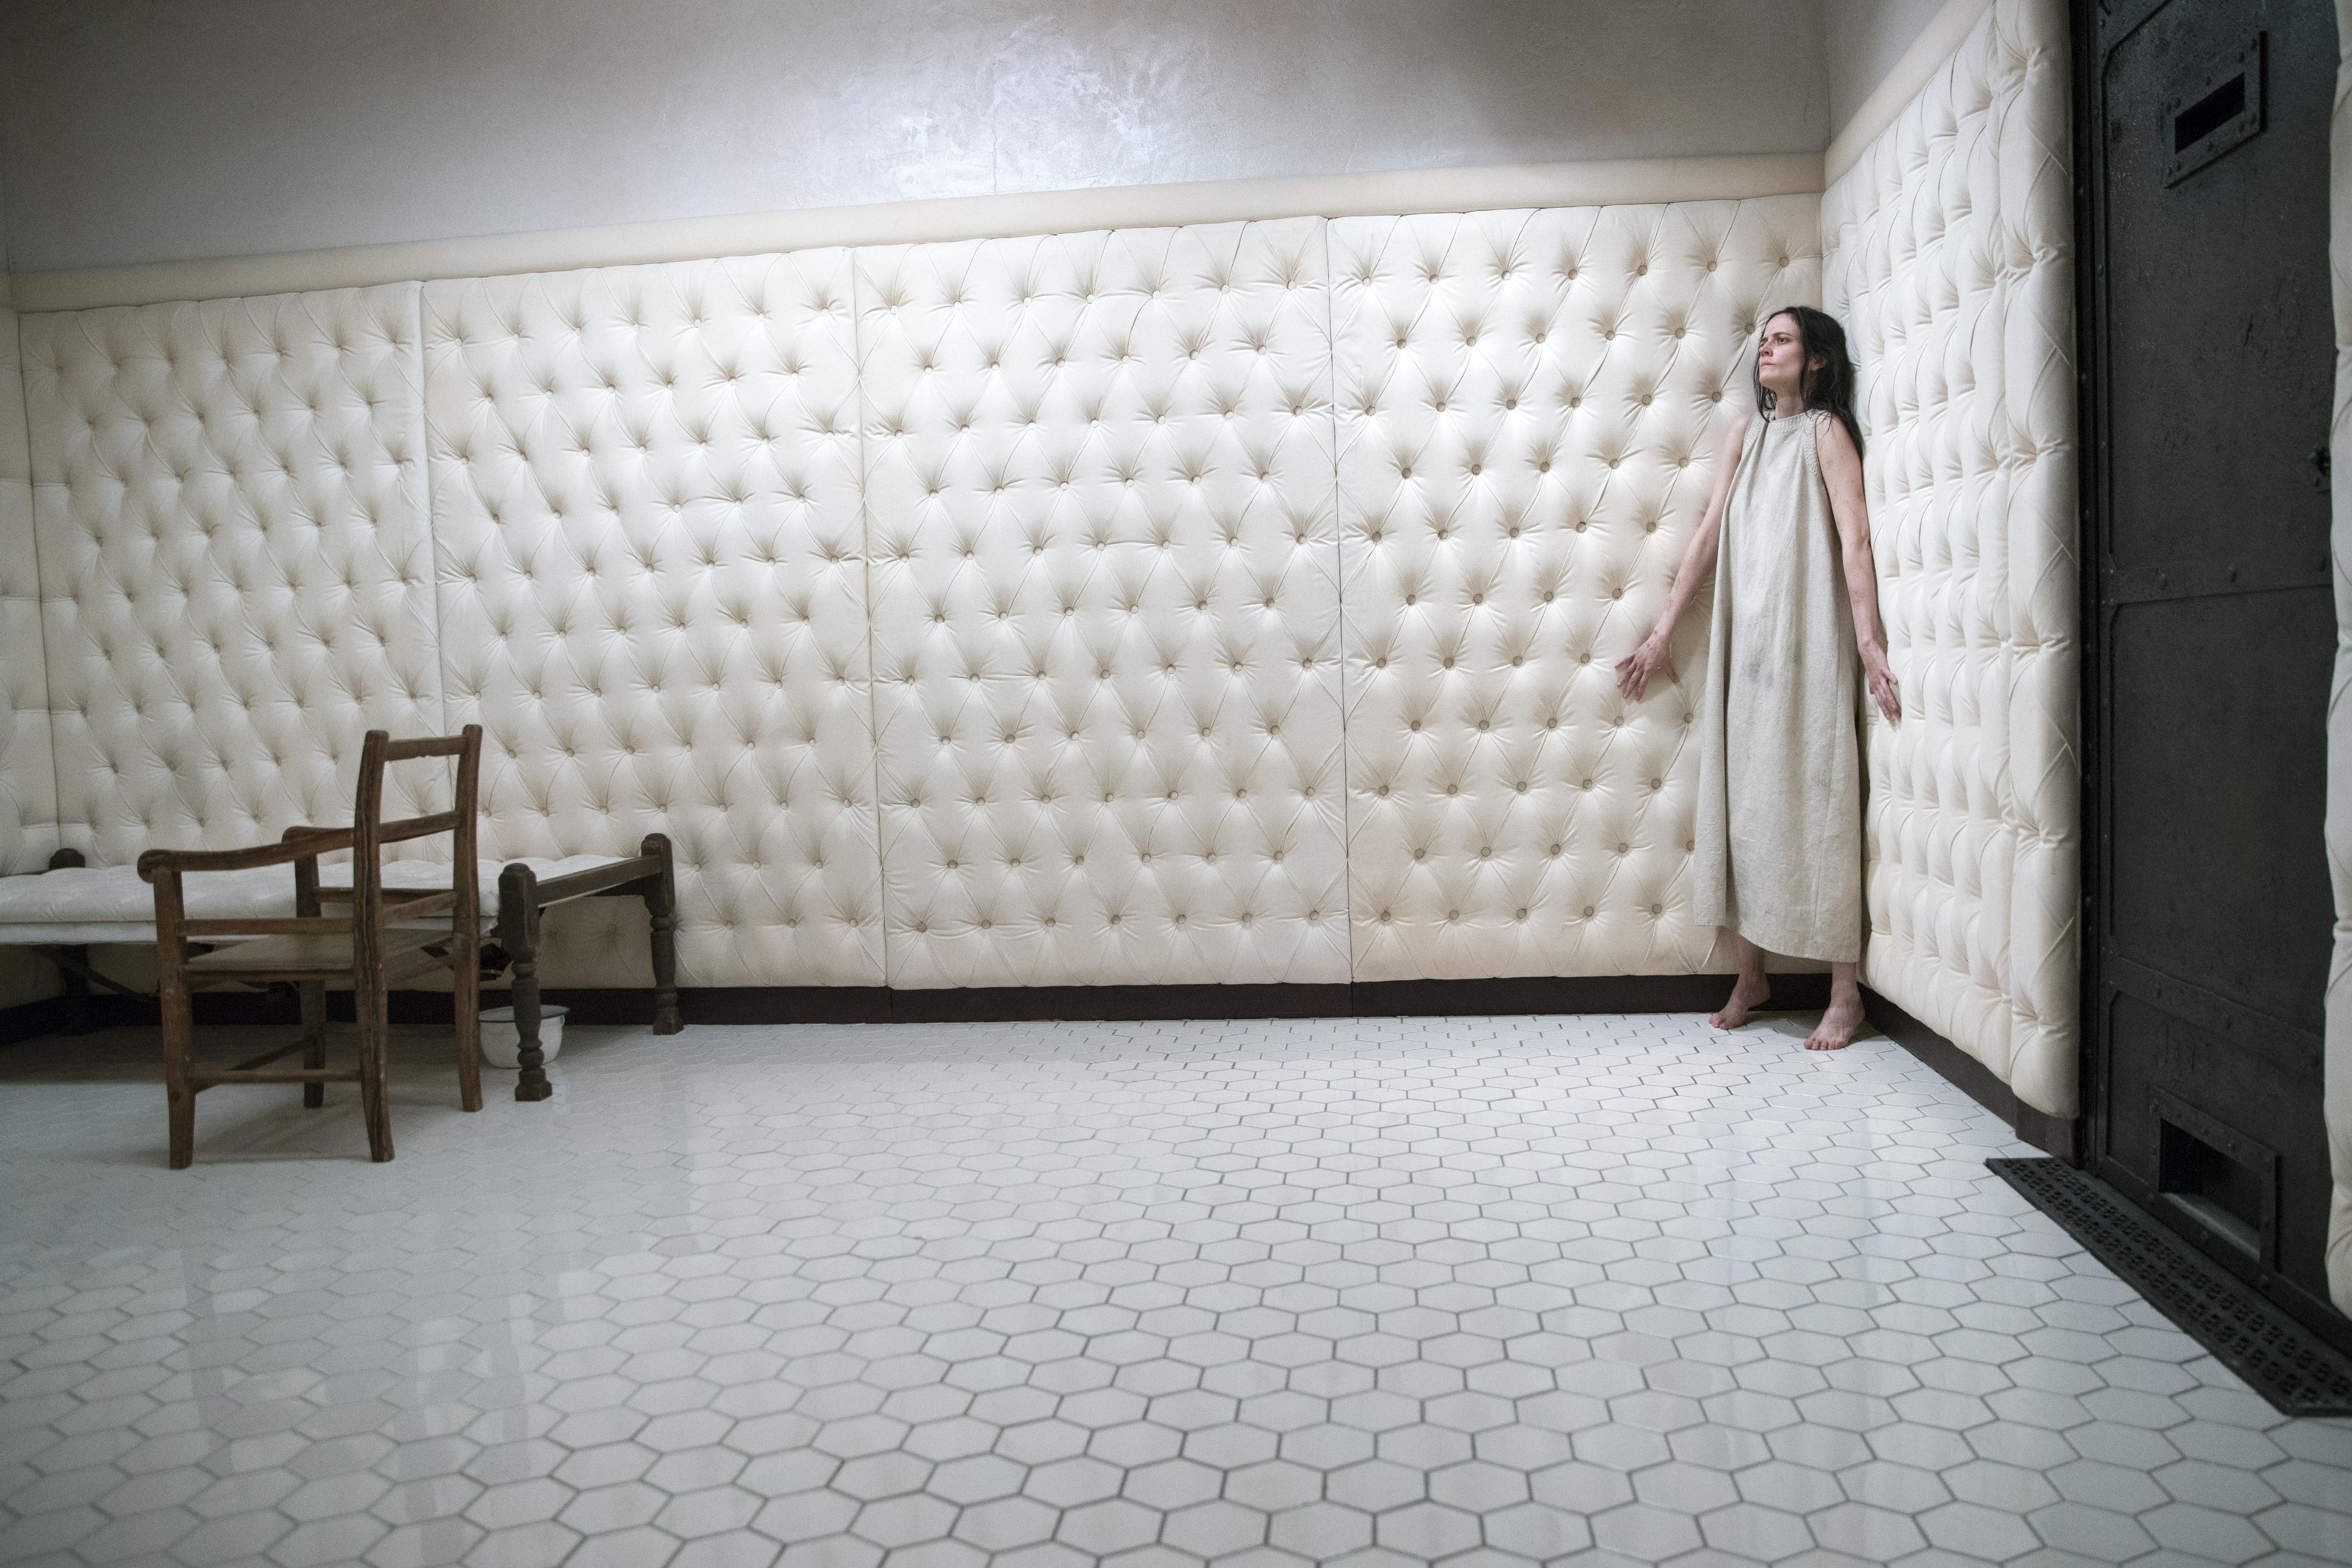 Straitjacket White Room